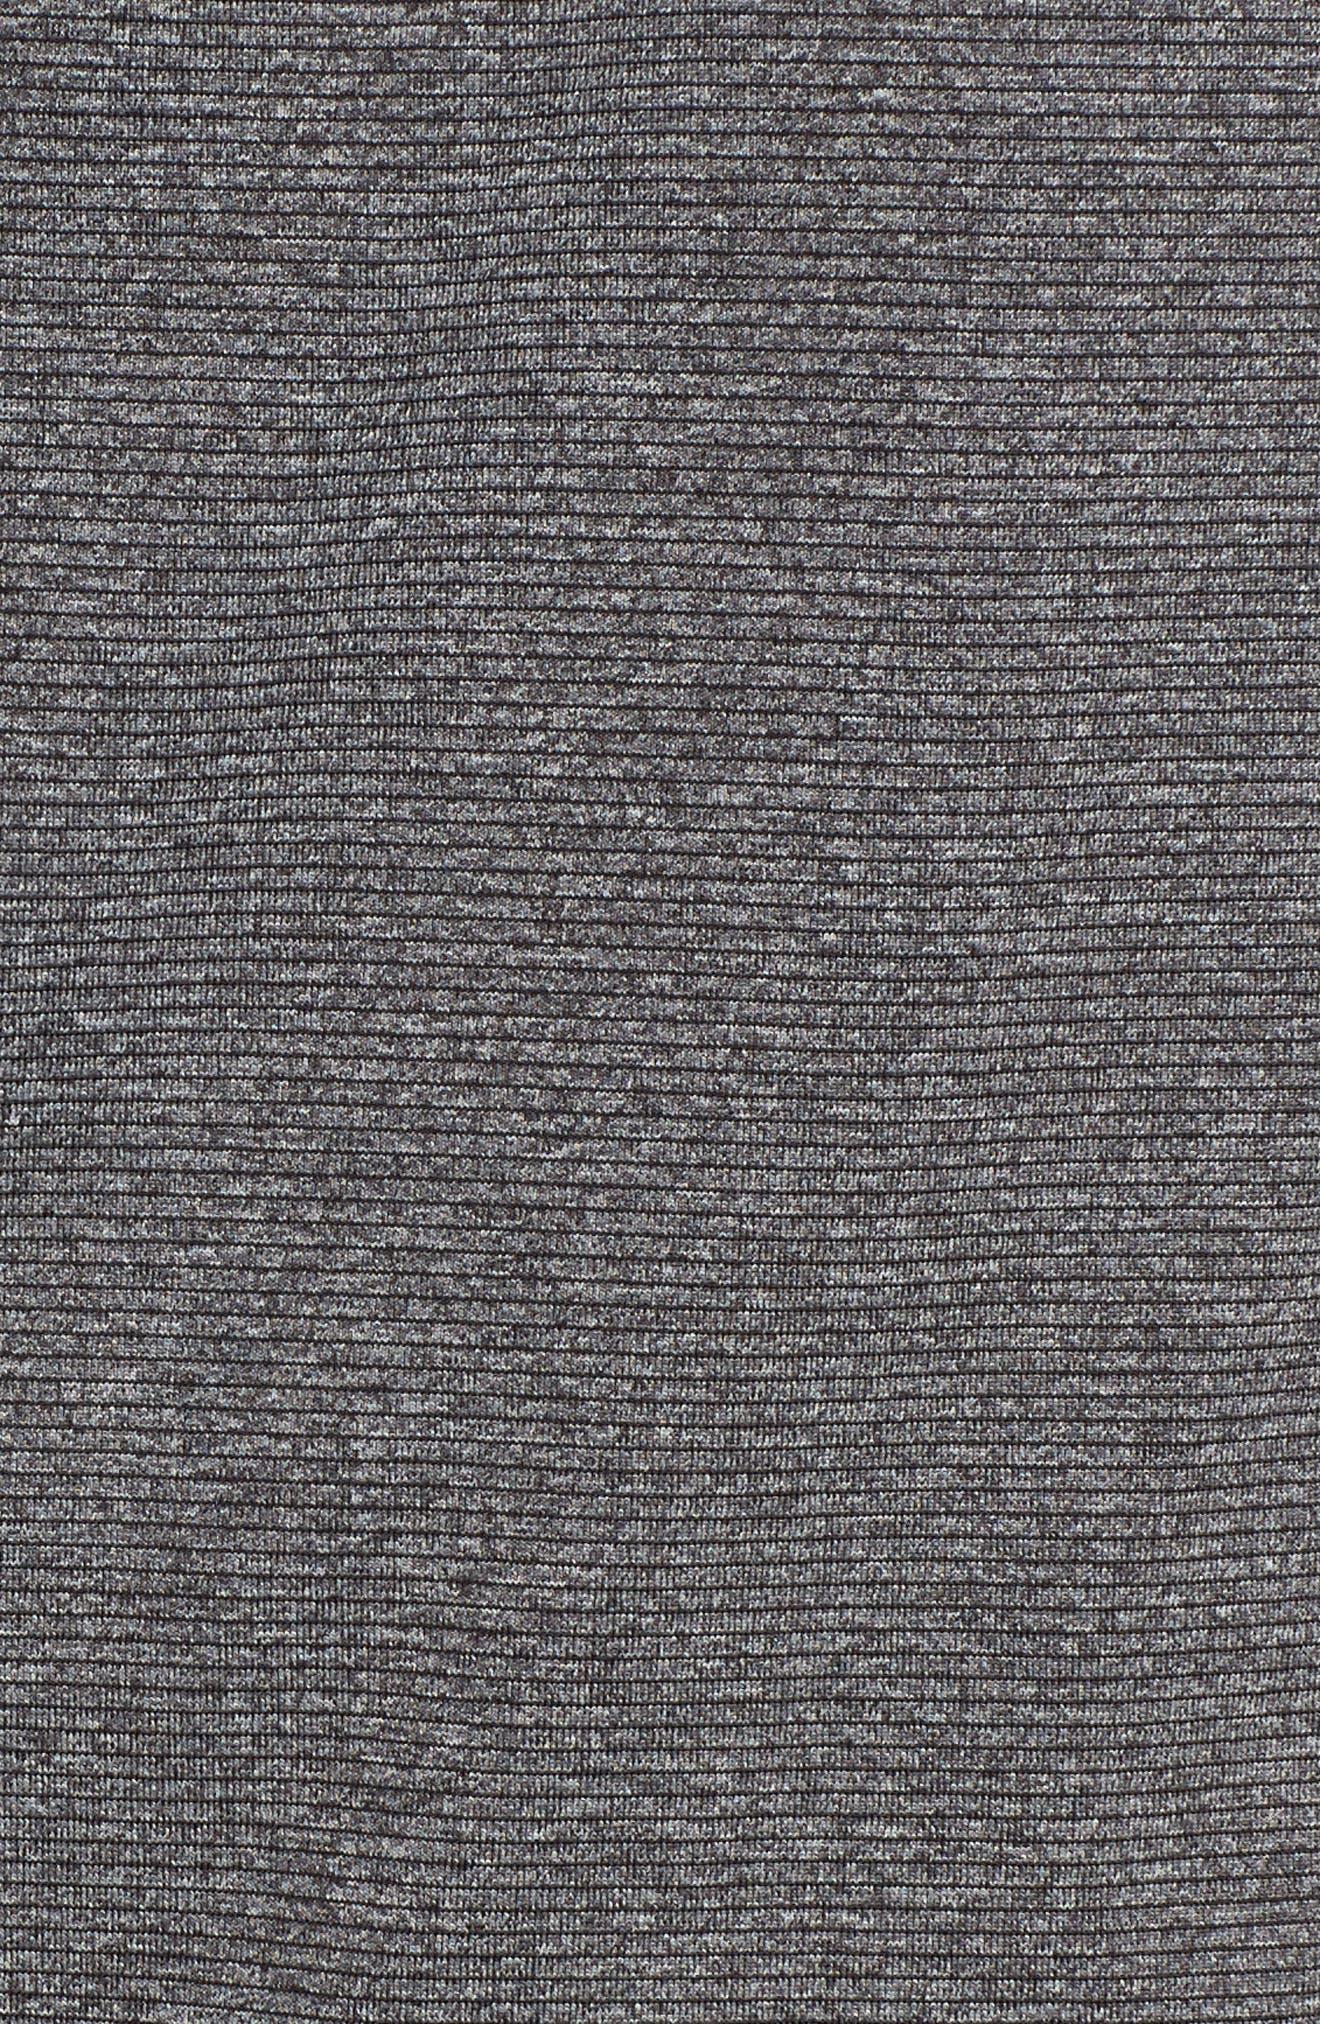 Shoreline - Atlanta Falcons Half Zip Pullover,                             Alternate thumbnail 5, color,                             Charcoal Heather